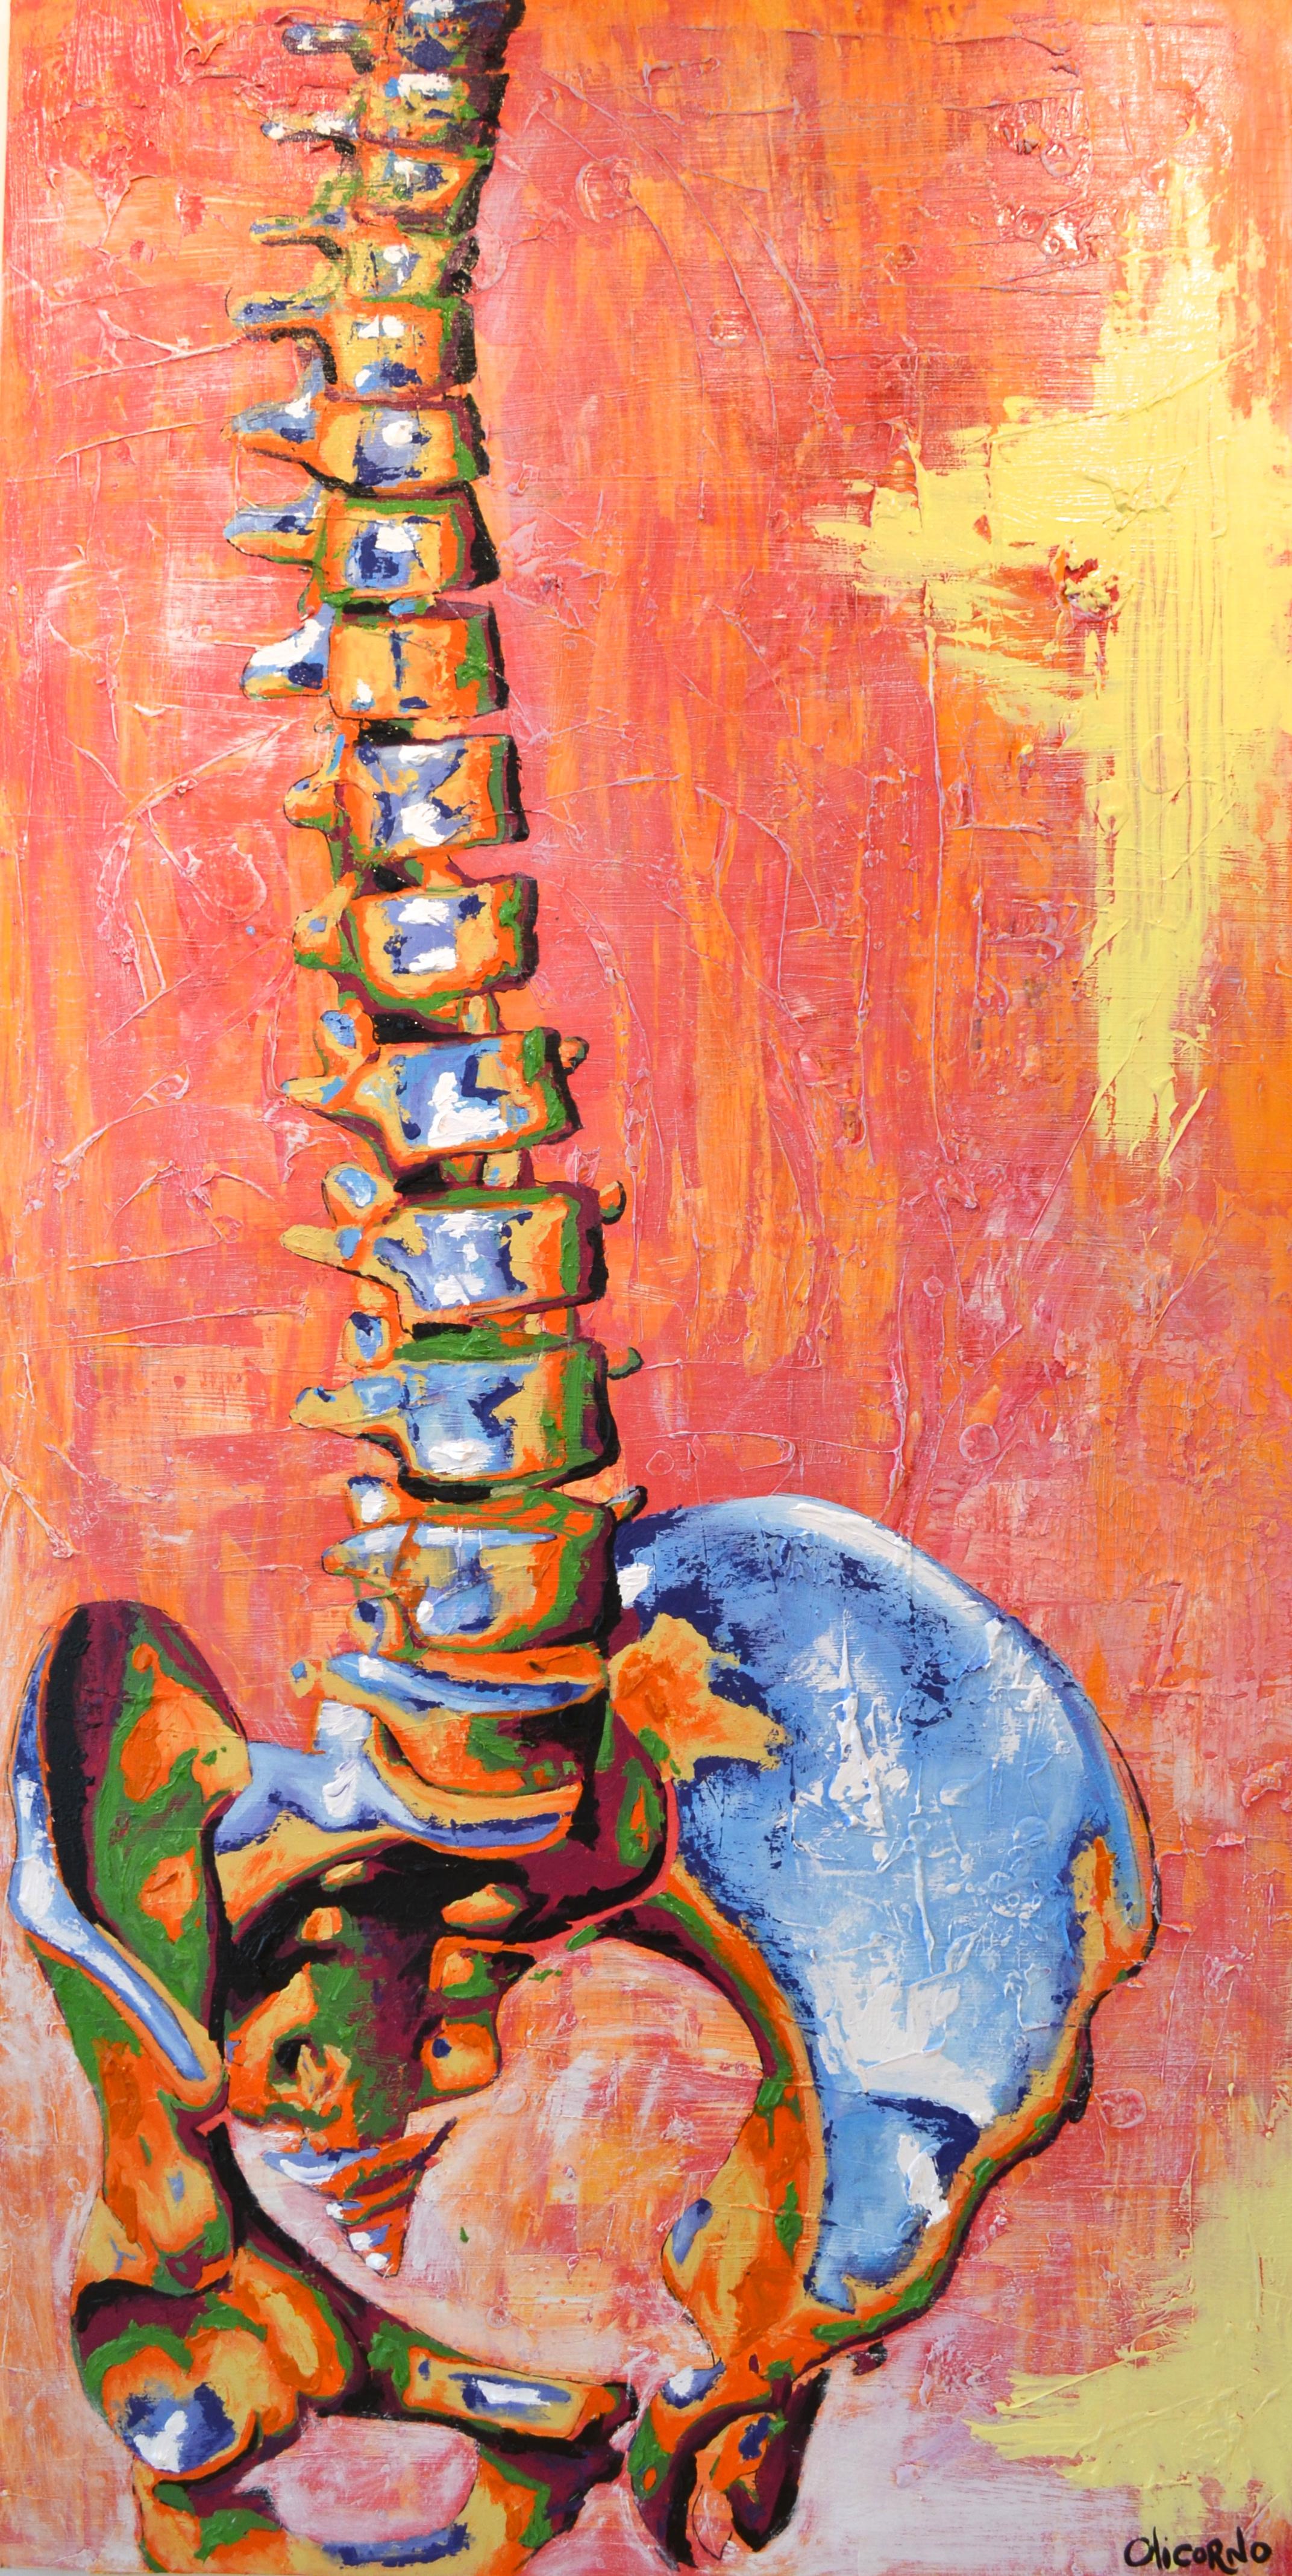 Olicorno - ''Debout #2'' de la série Bones, acryliques, 2016 (96''x48'') 4750$